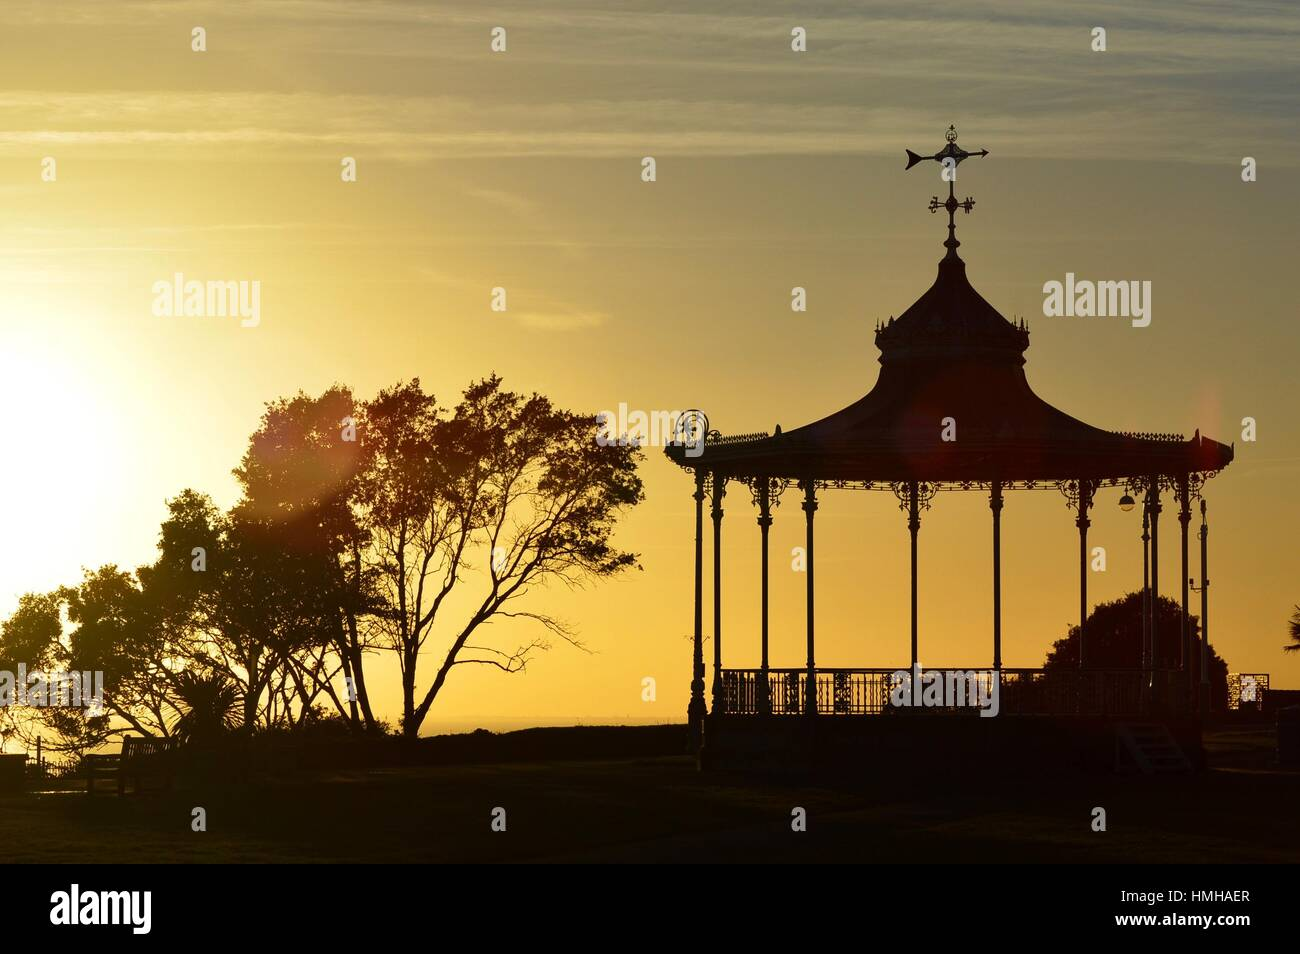 Ornate Bandstand - Stock Image